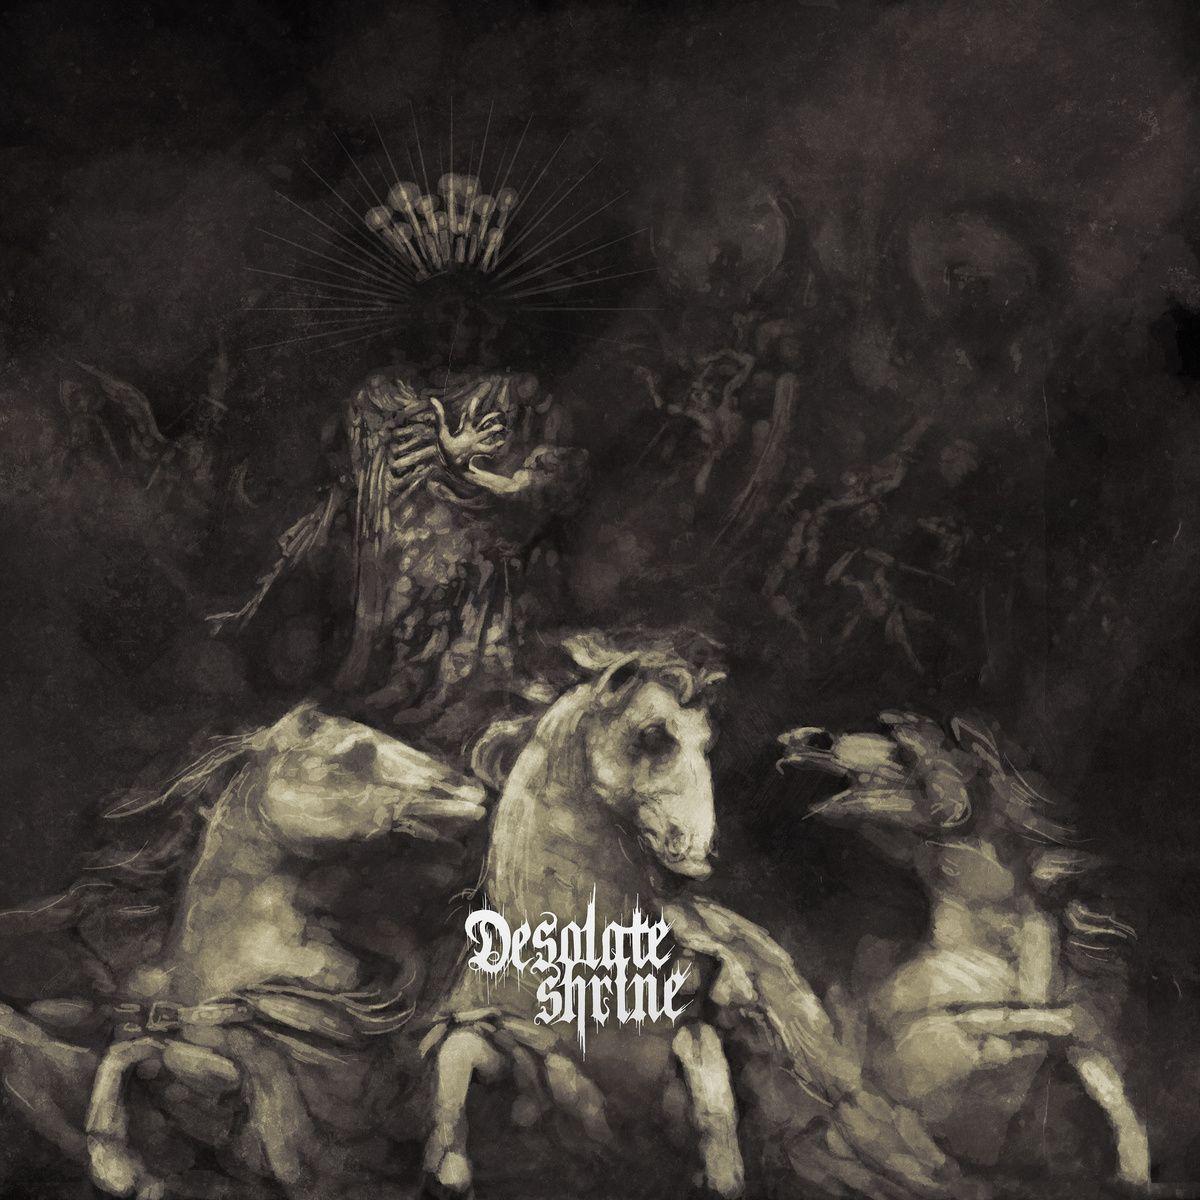 Desolate Shrine - The Heart of the Netherworld (2015) review @ Murska-arviot